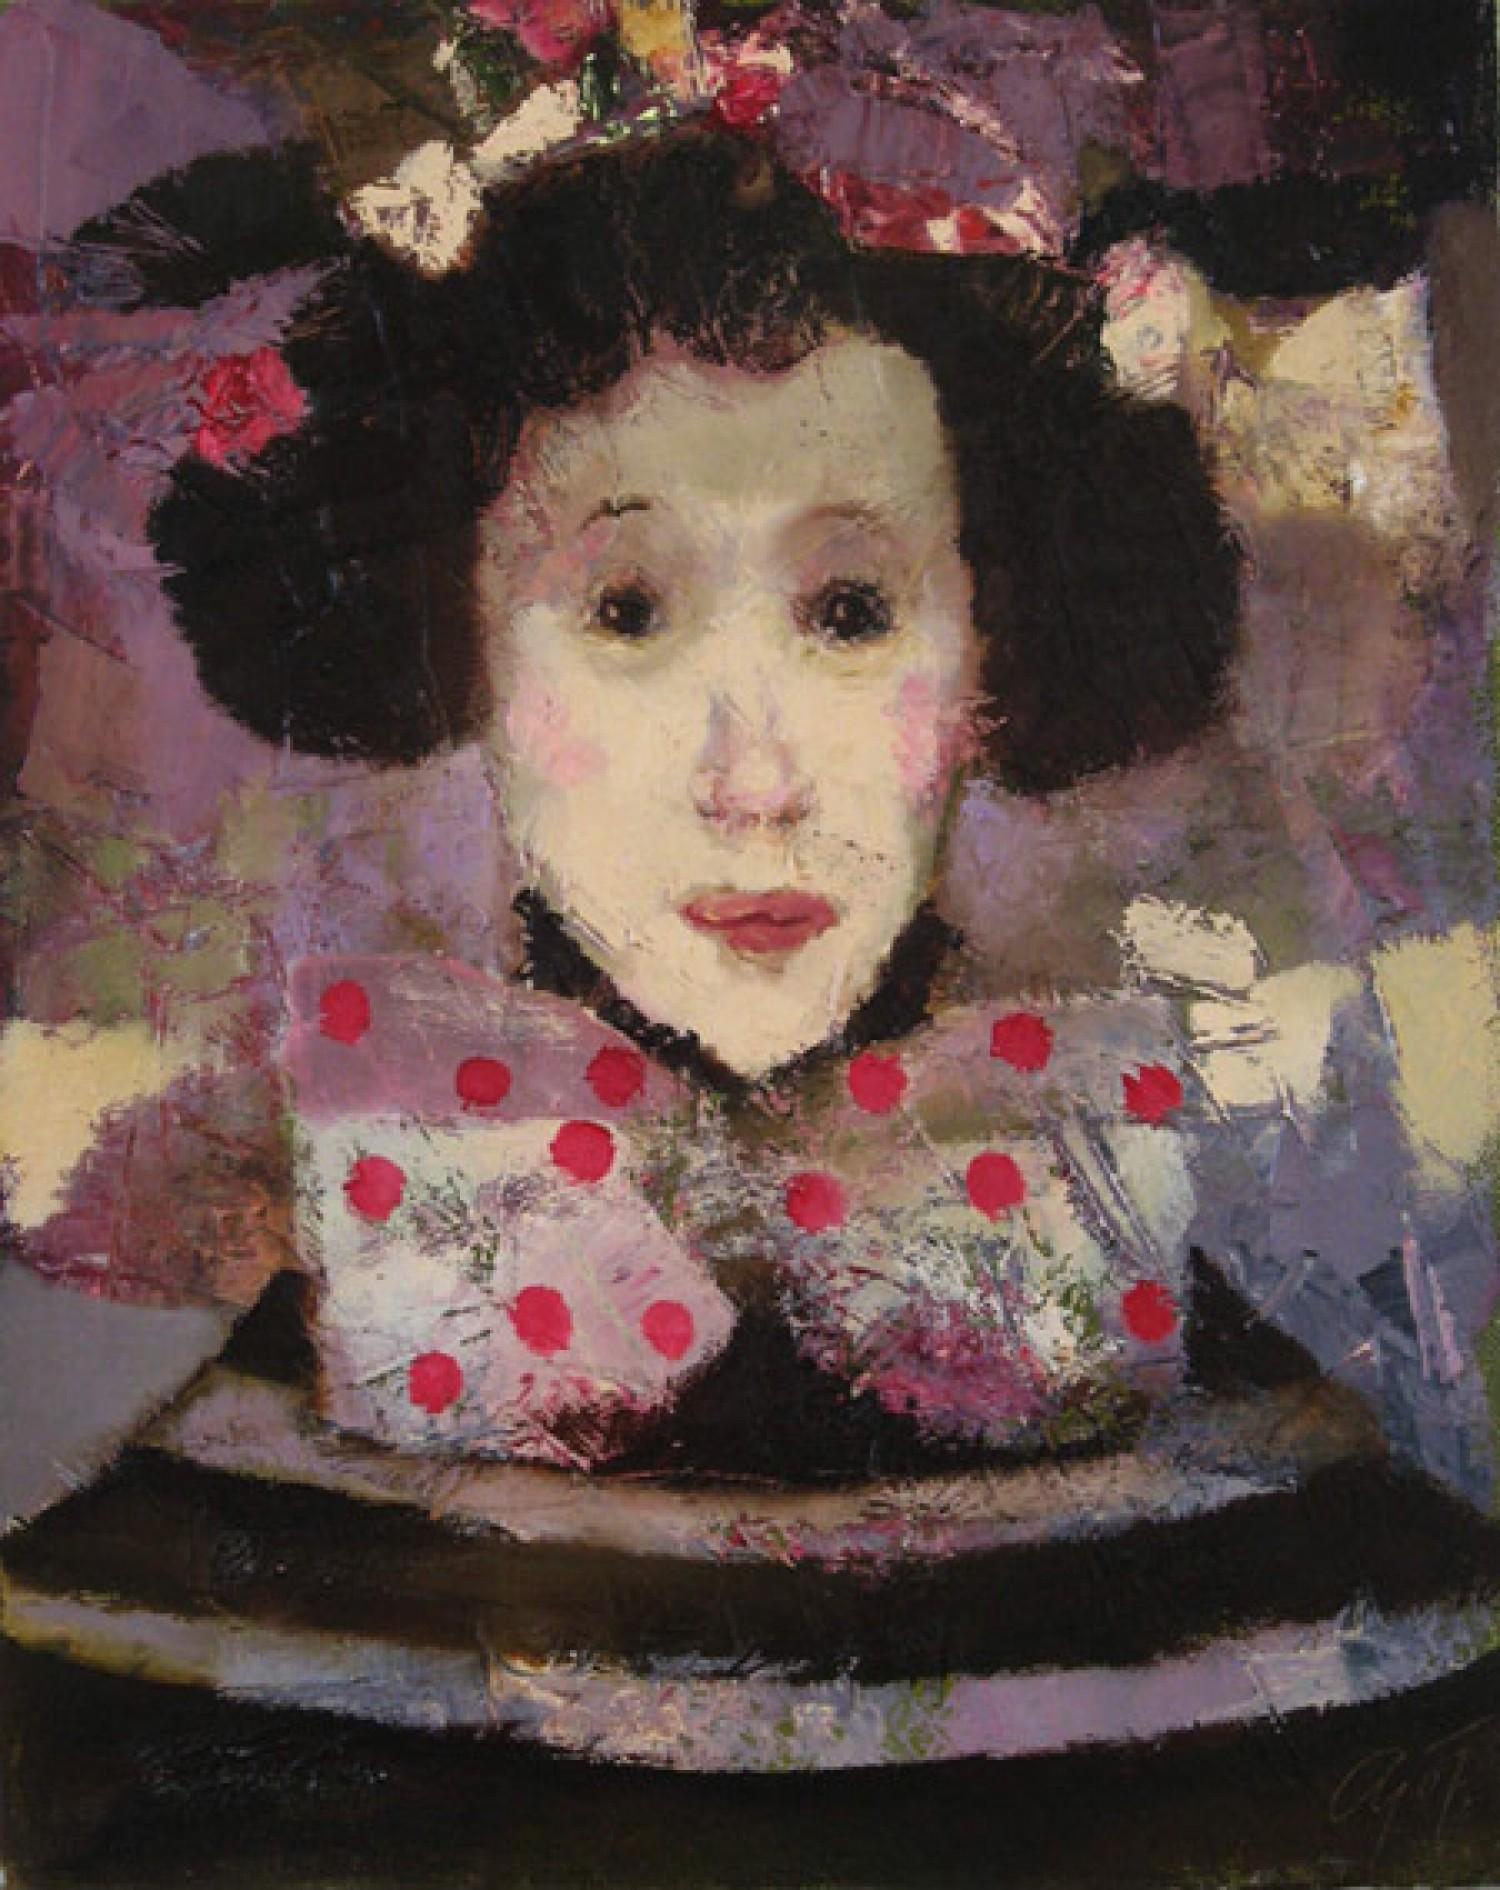 А.Л.Аранышев. Девочка с бантом. 2007 г. 50х40 см. Холст, масло.